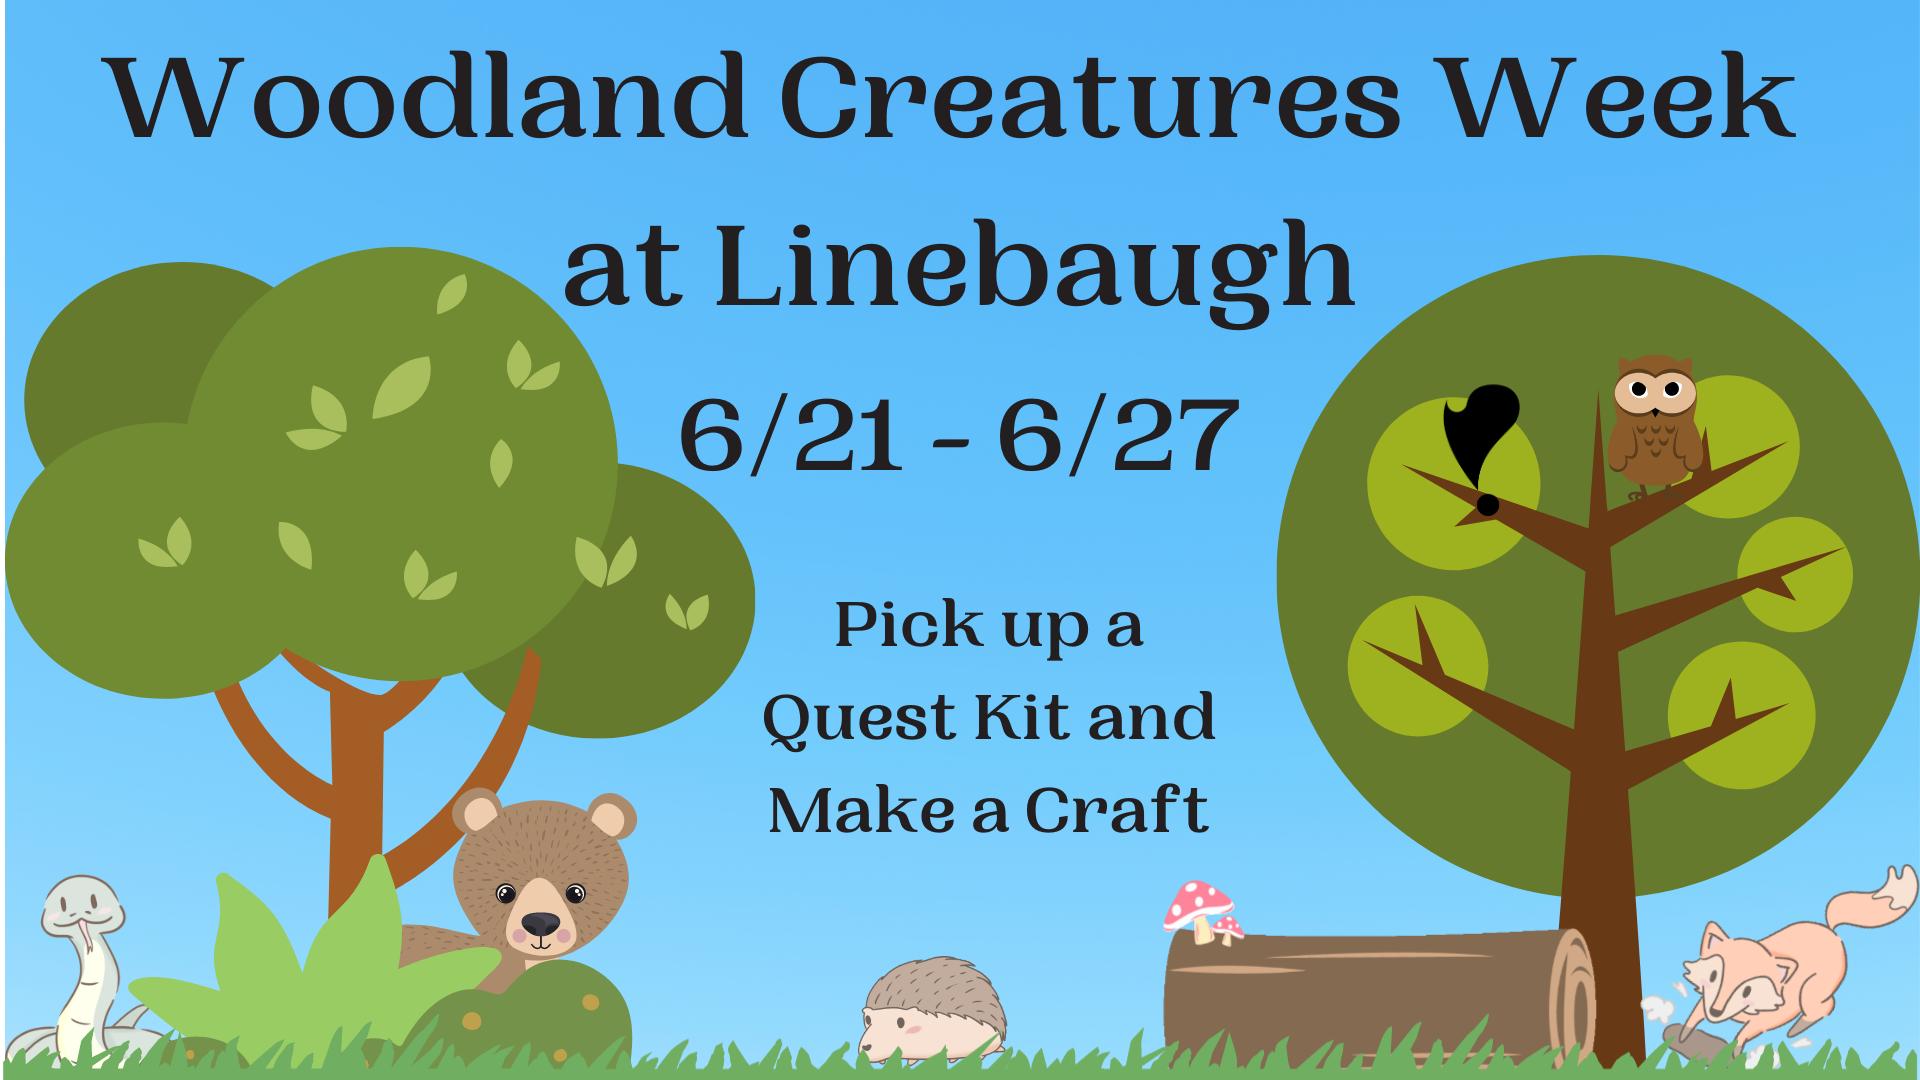 Woodland Creatures Week at Linebaugh